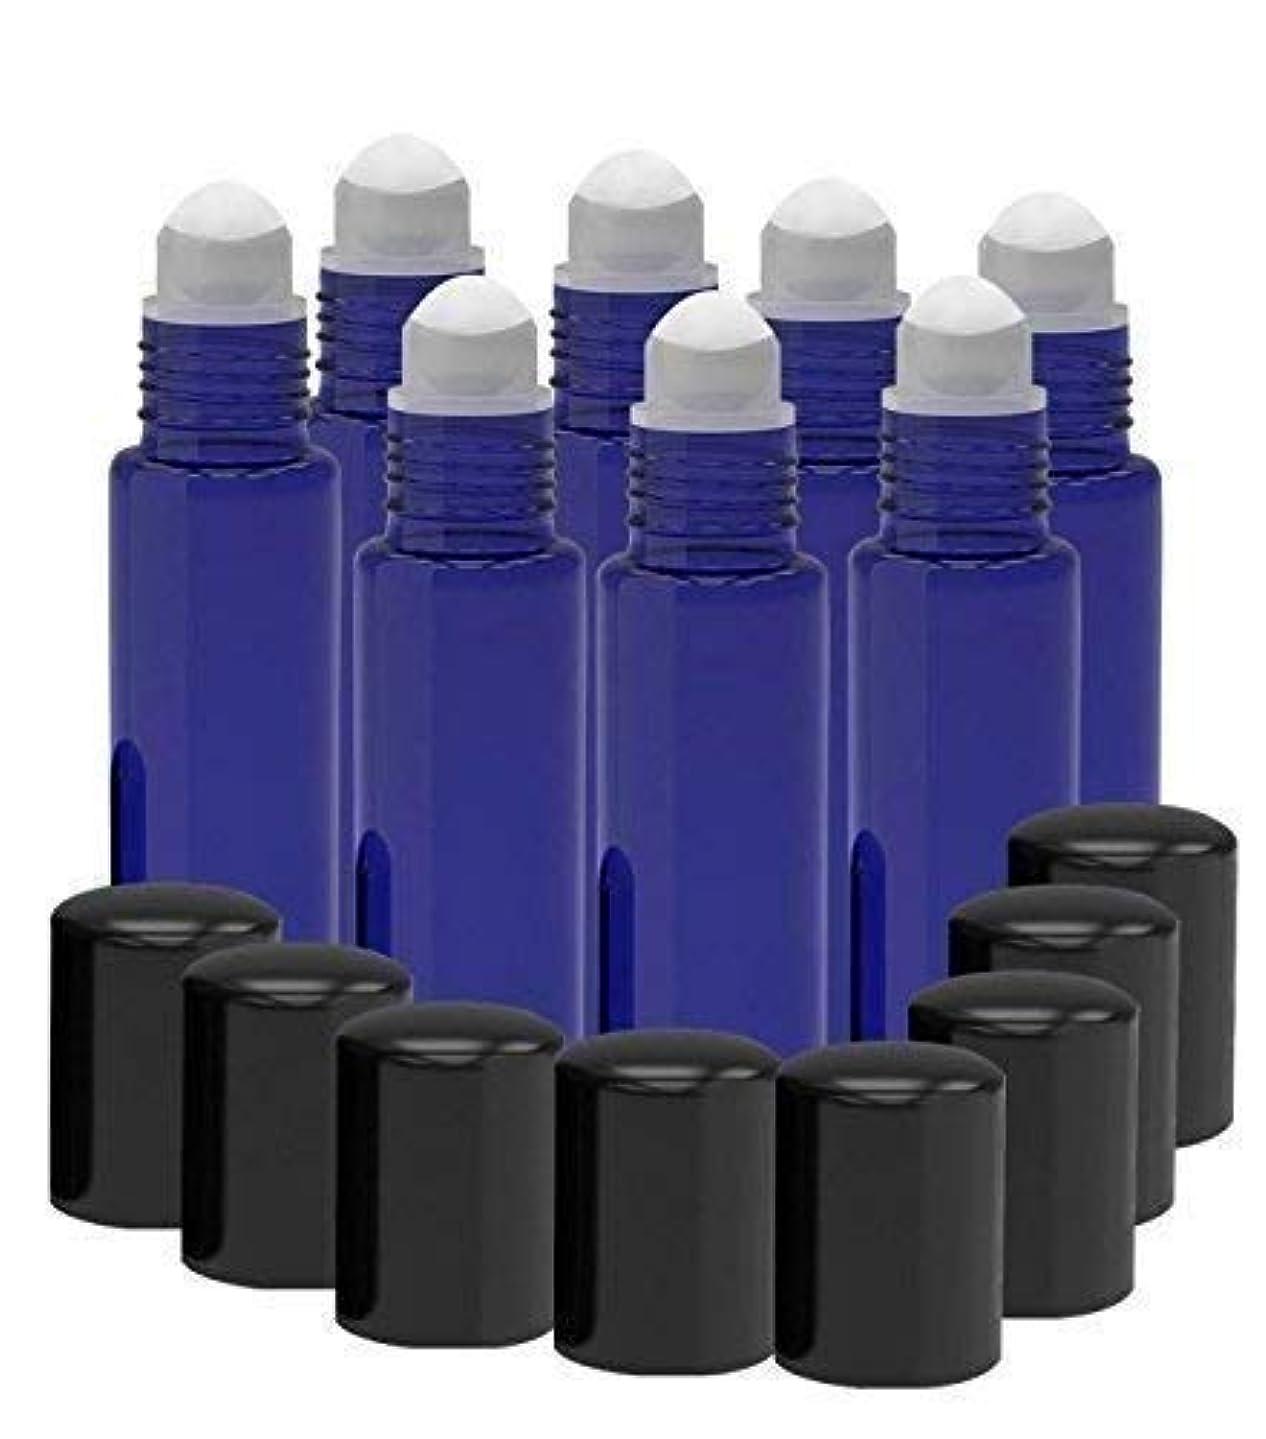 8 Pack - Essential Oil Roller Bottles [PLASTIC ROLLER BALL] 10ml Refillable Glass Color Roll On for Fragrance Essential Oil - Metal Chrome Roller Ball - 10 ml 1/3 oz (Cobalt Blue)